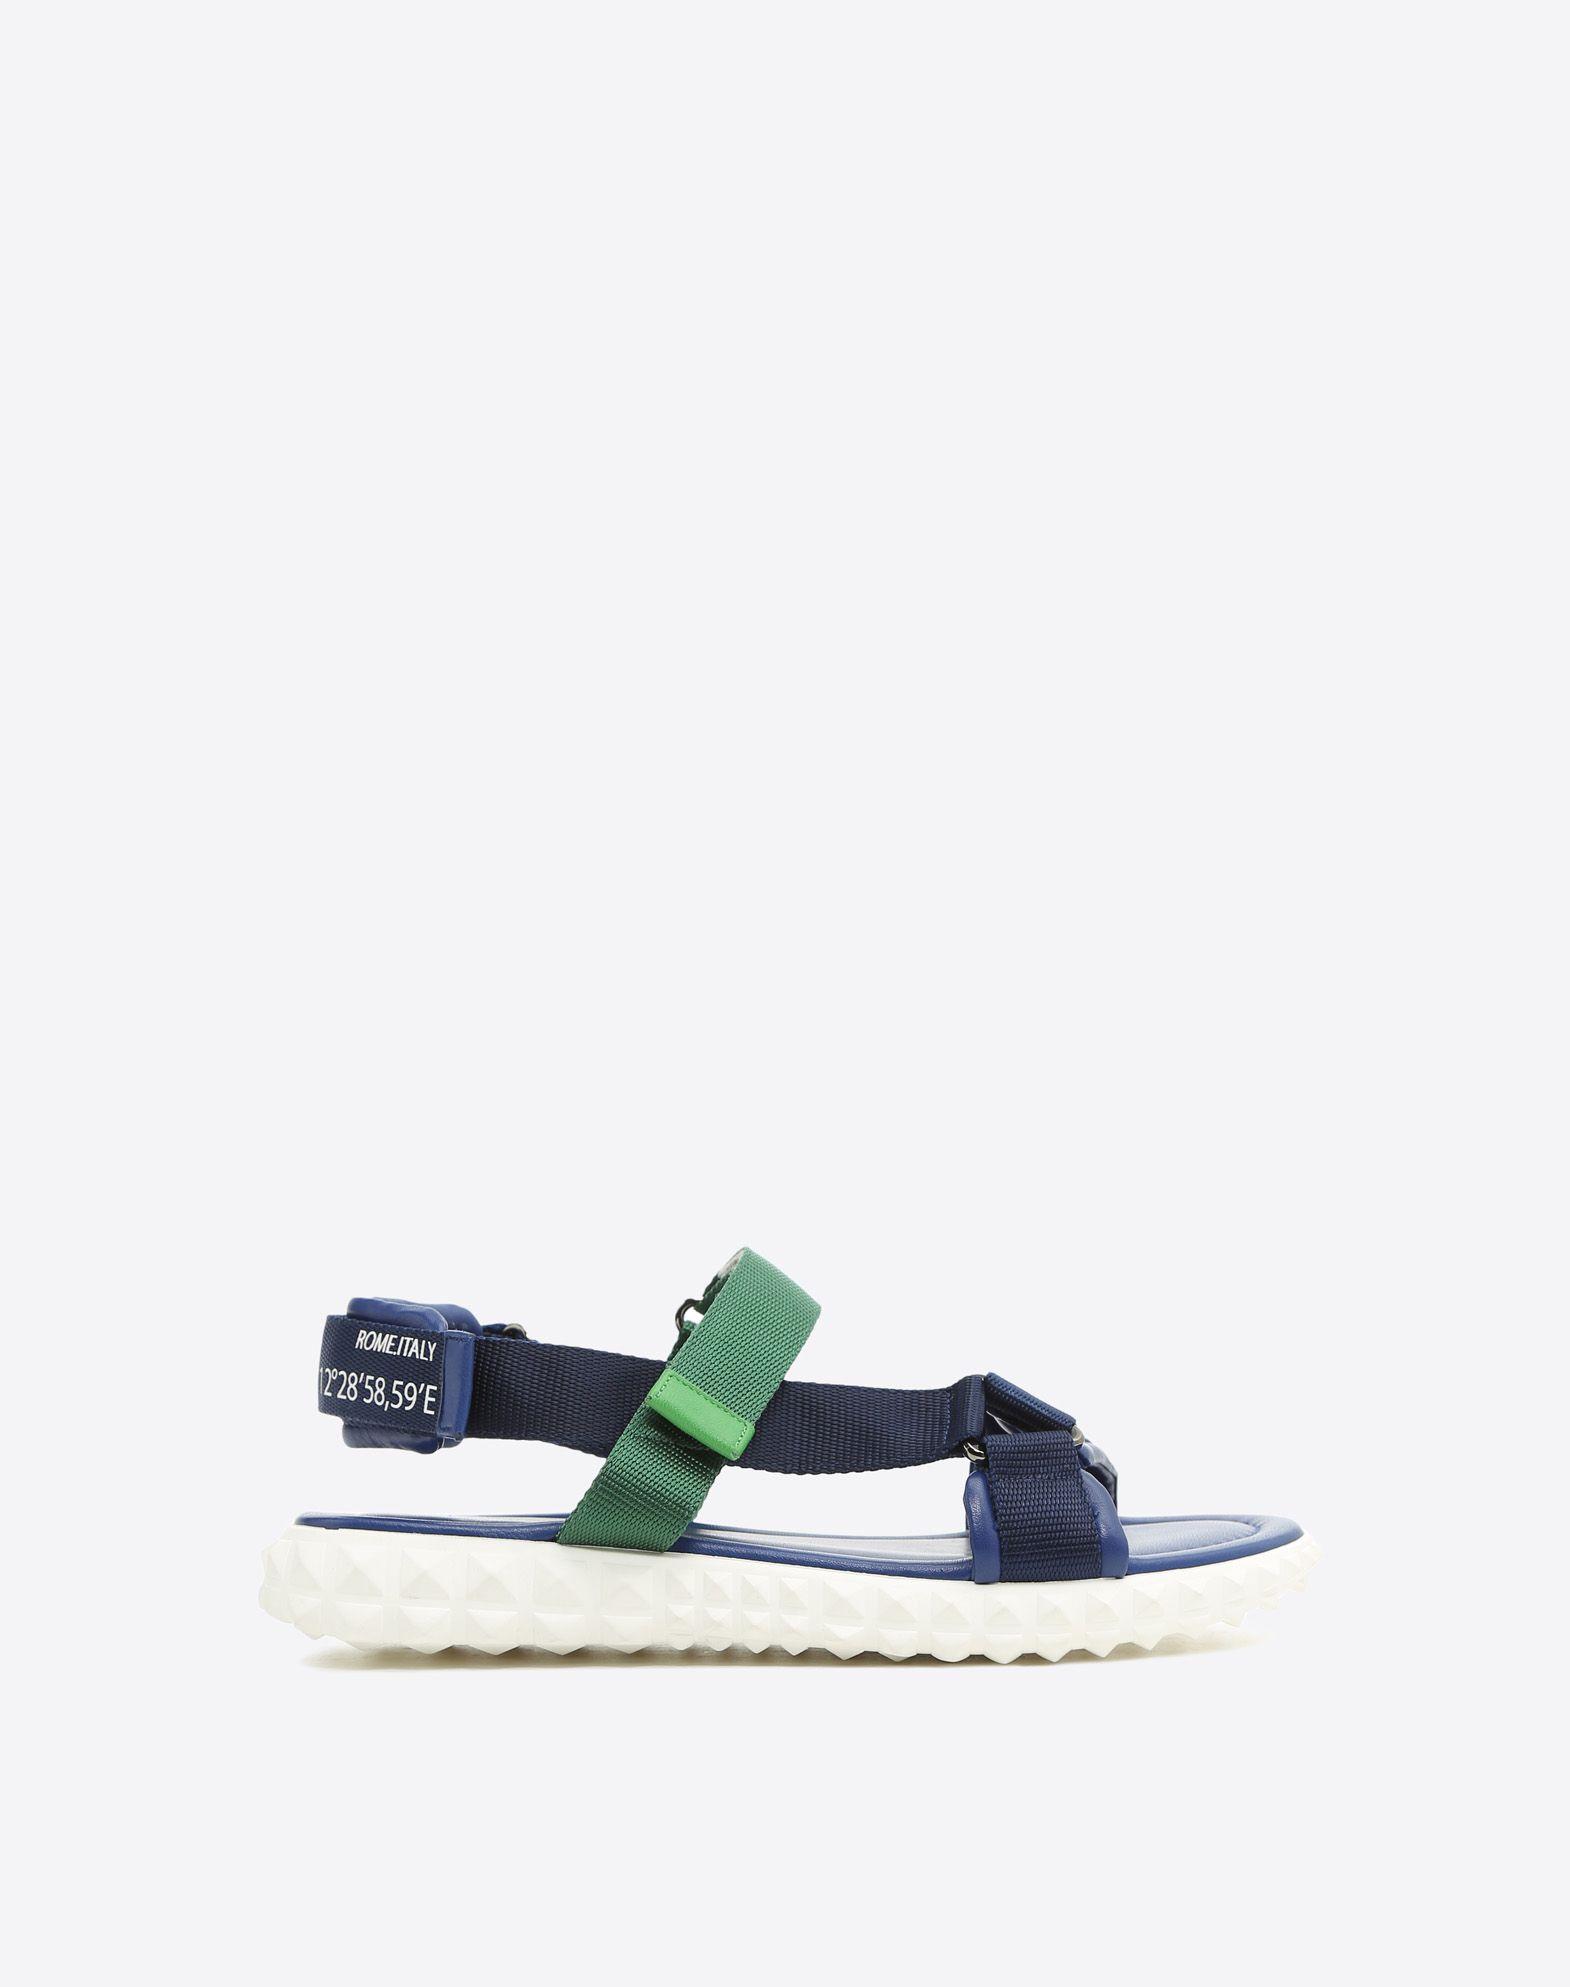 VALENTINO GARAVANI UOMO Coordinates 凉鞋 FLAT SANDALS U f